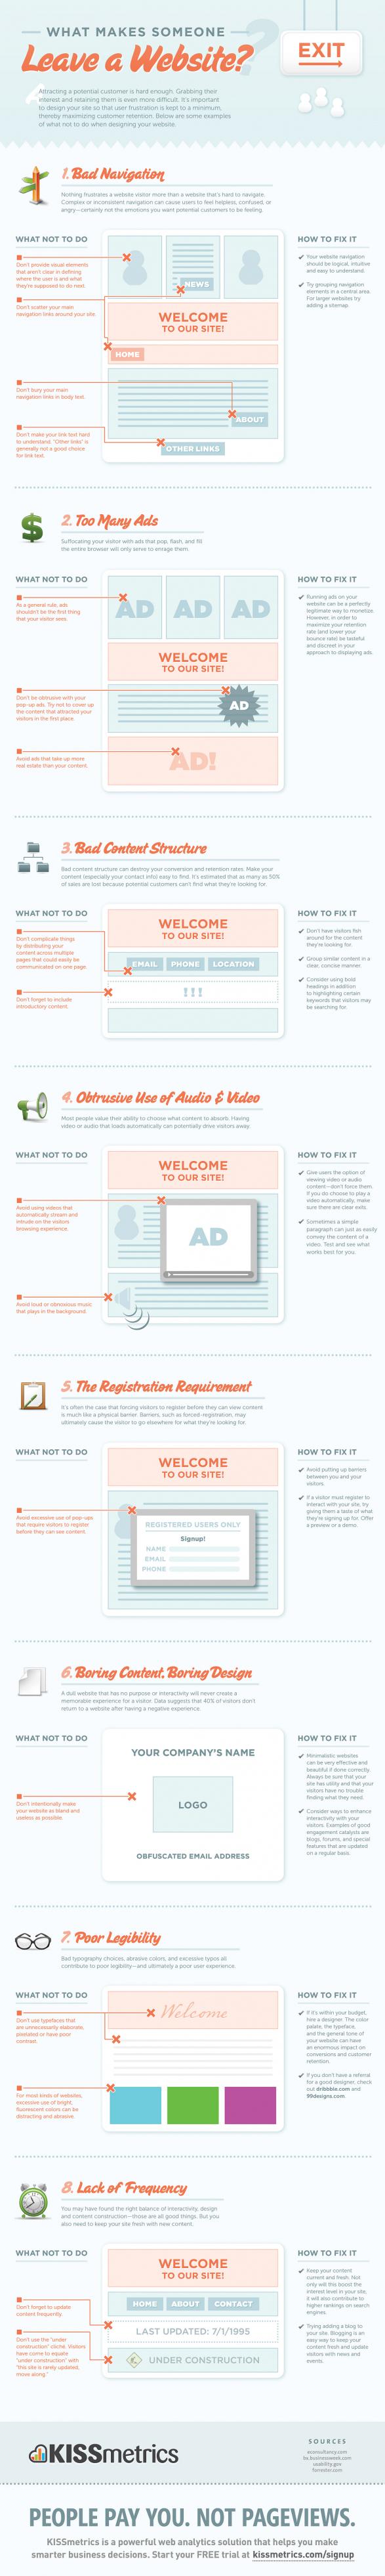 website-design-tips-infographic